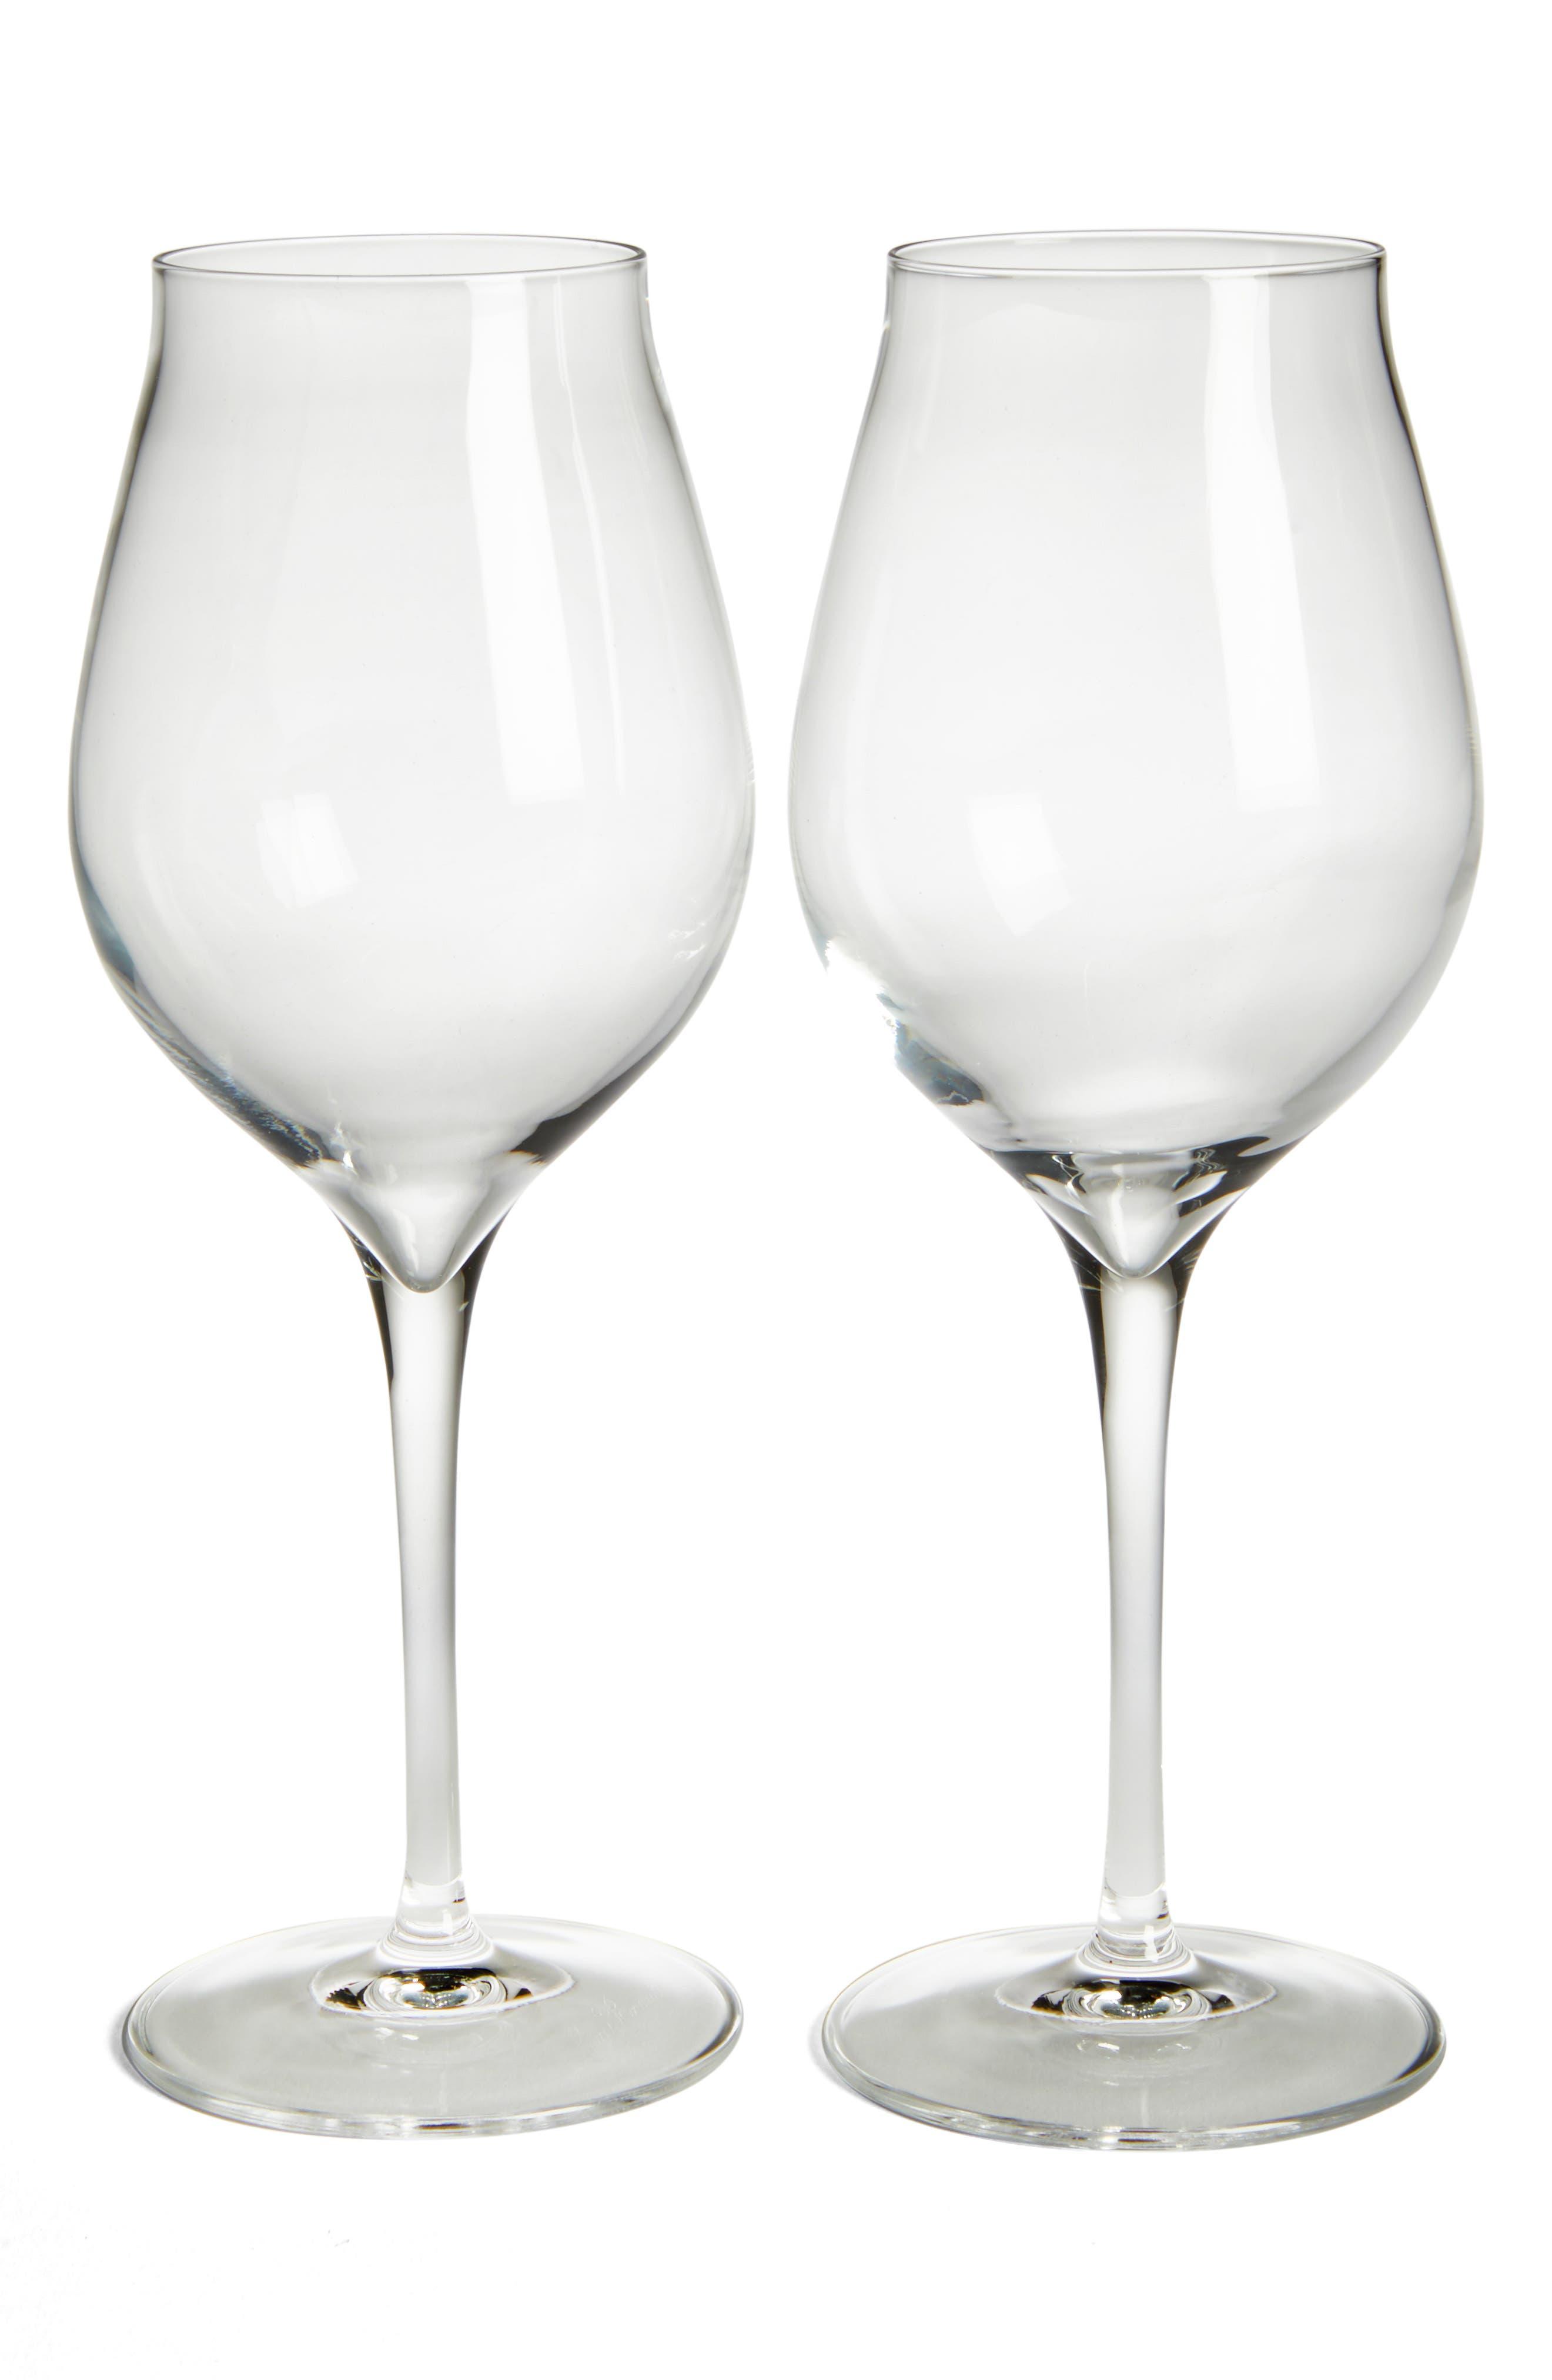 Alternate Image 1 Selected - Luigi Bormiolo Vinea Malvasia/Orvieto Set of 2 White Wine Glasses